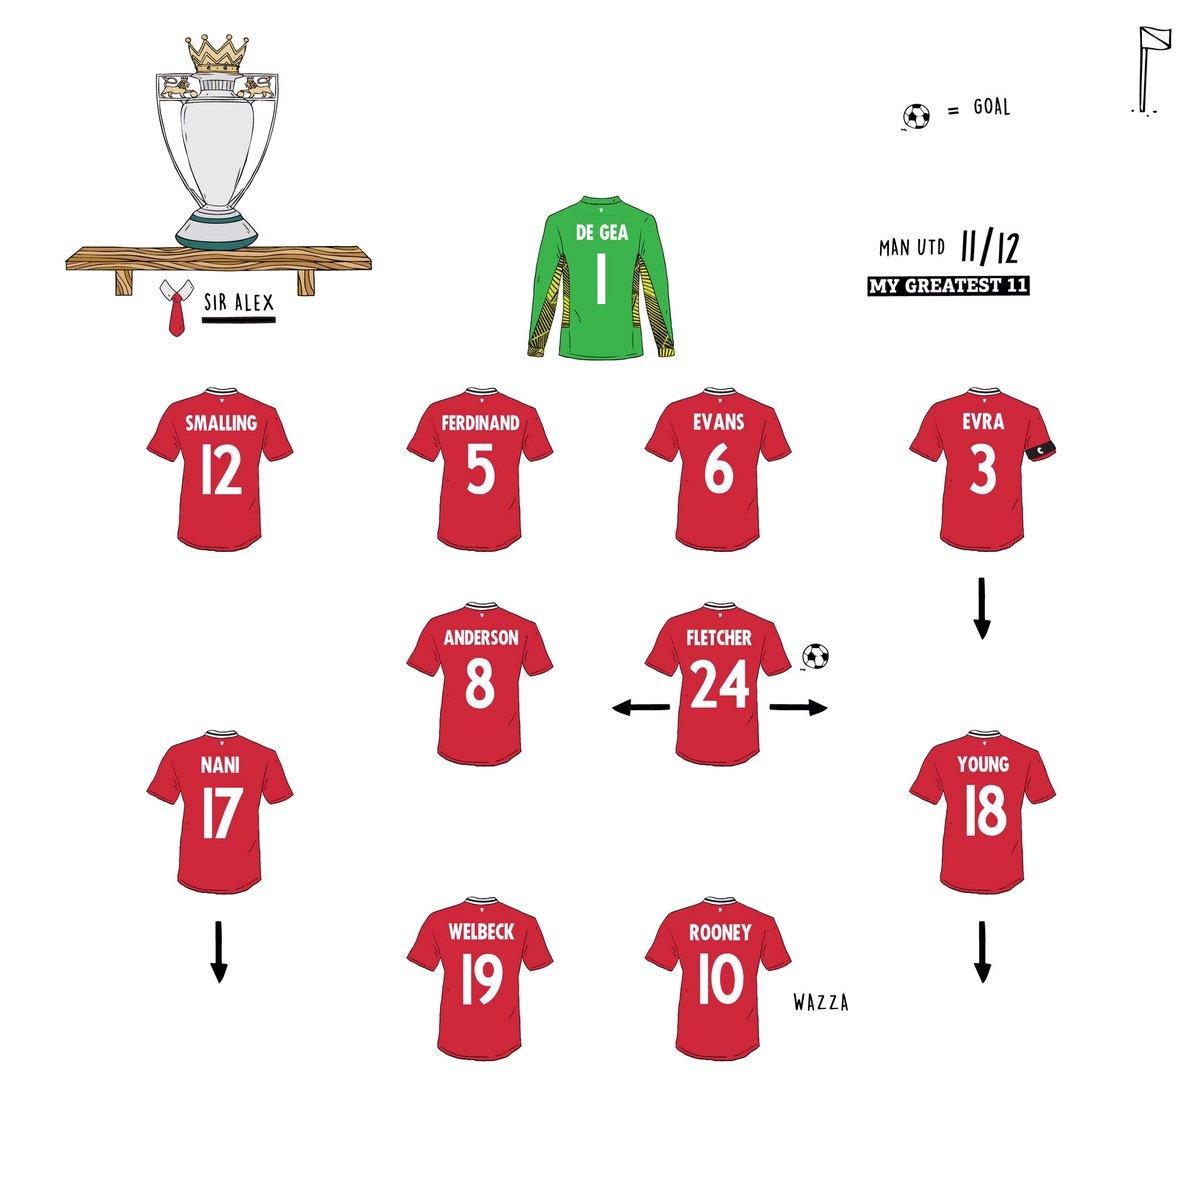 23/10/11  Man Utd 1-6 Man City https://t.co/oJkycRPNKc